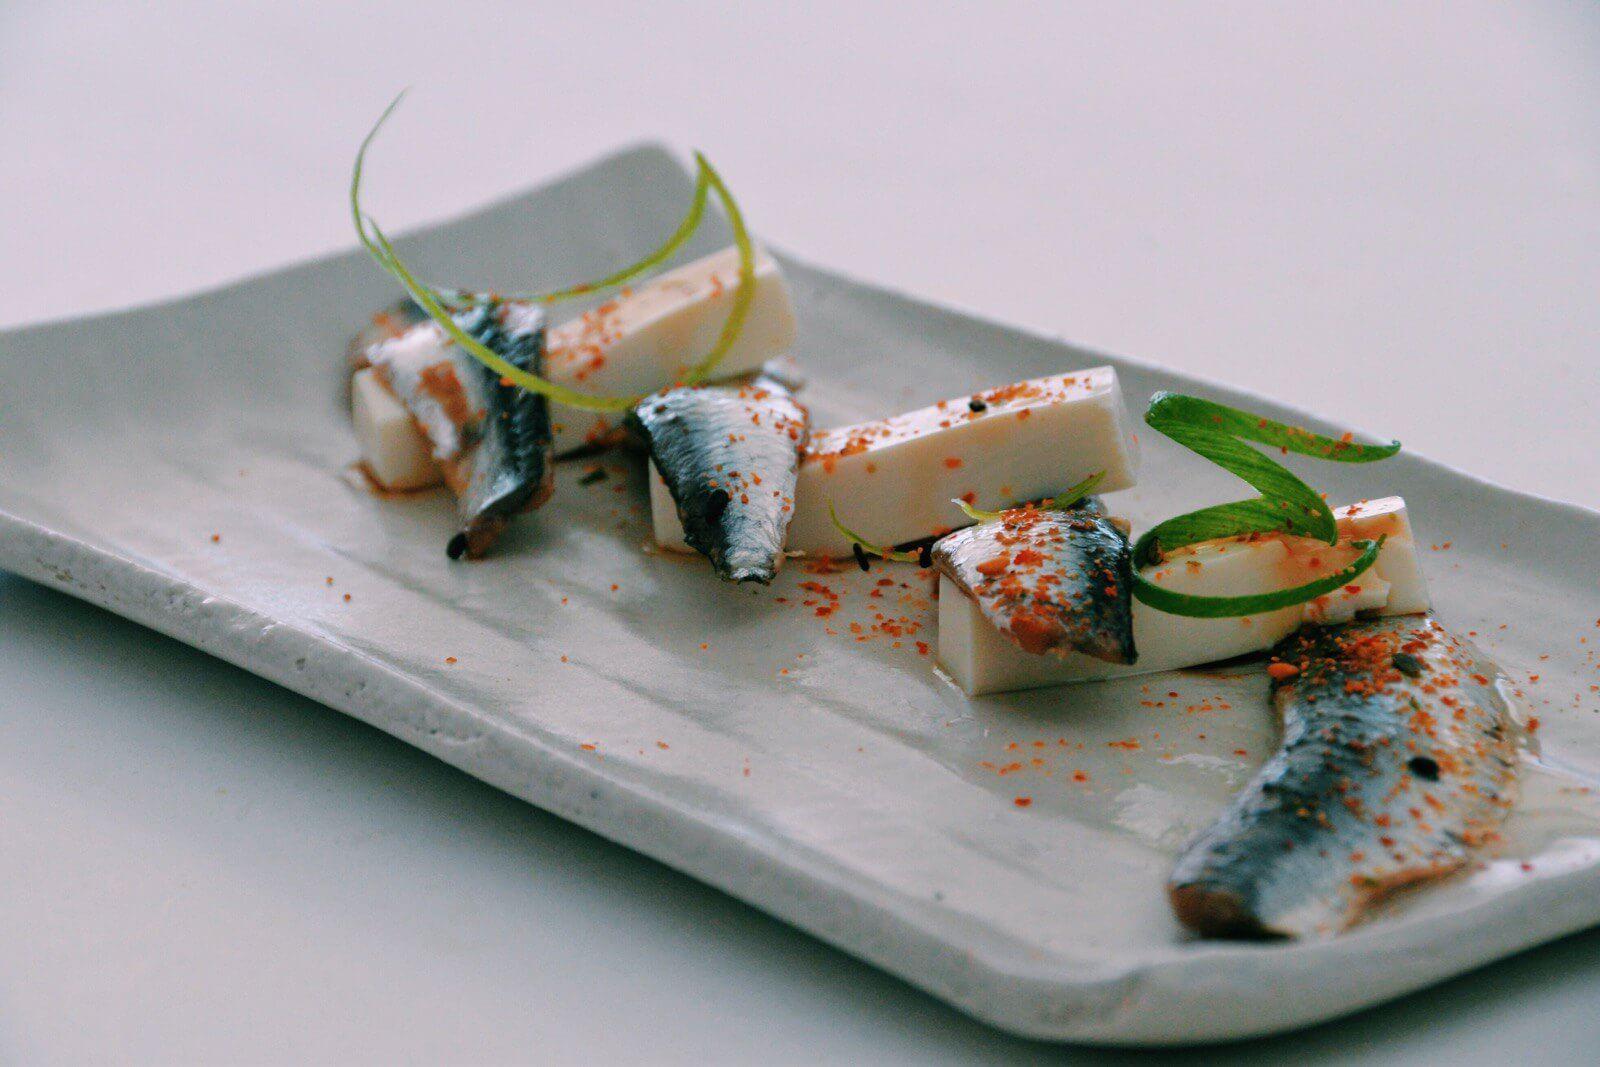 https://www.white-ibiza.com/wp-content/uploads/2020/03/formentera-restaurants-kokoy-2020-04.jpg